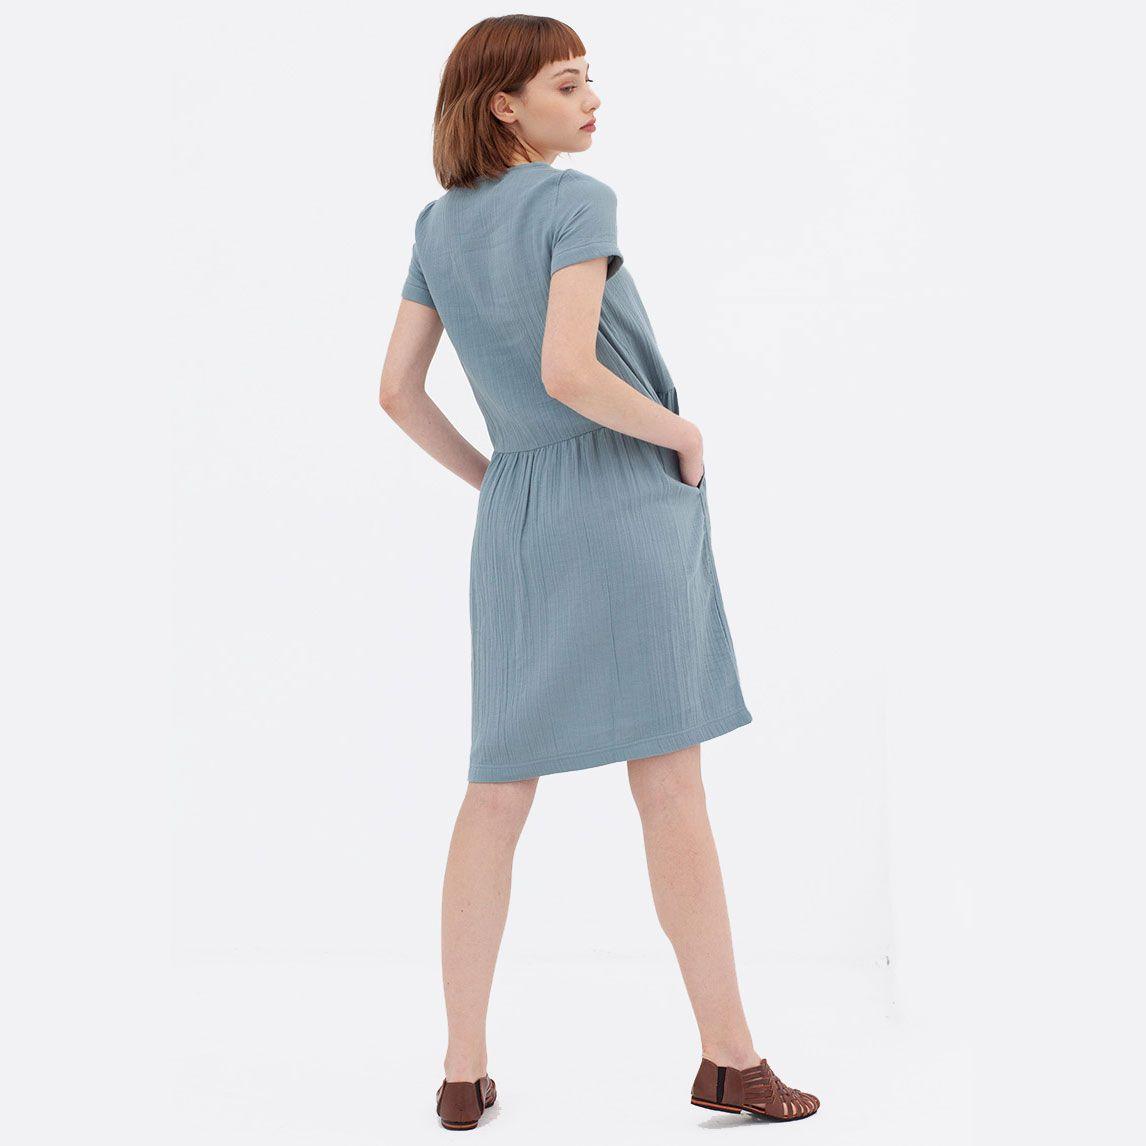 Espalda vestido ecológico azul de manga corta